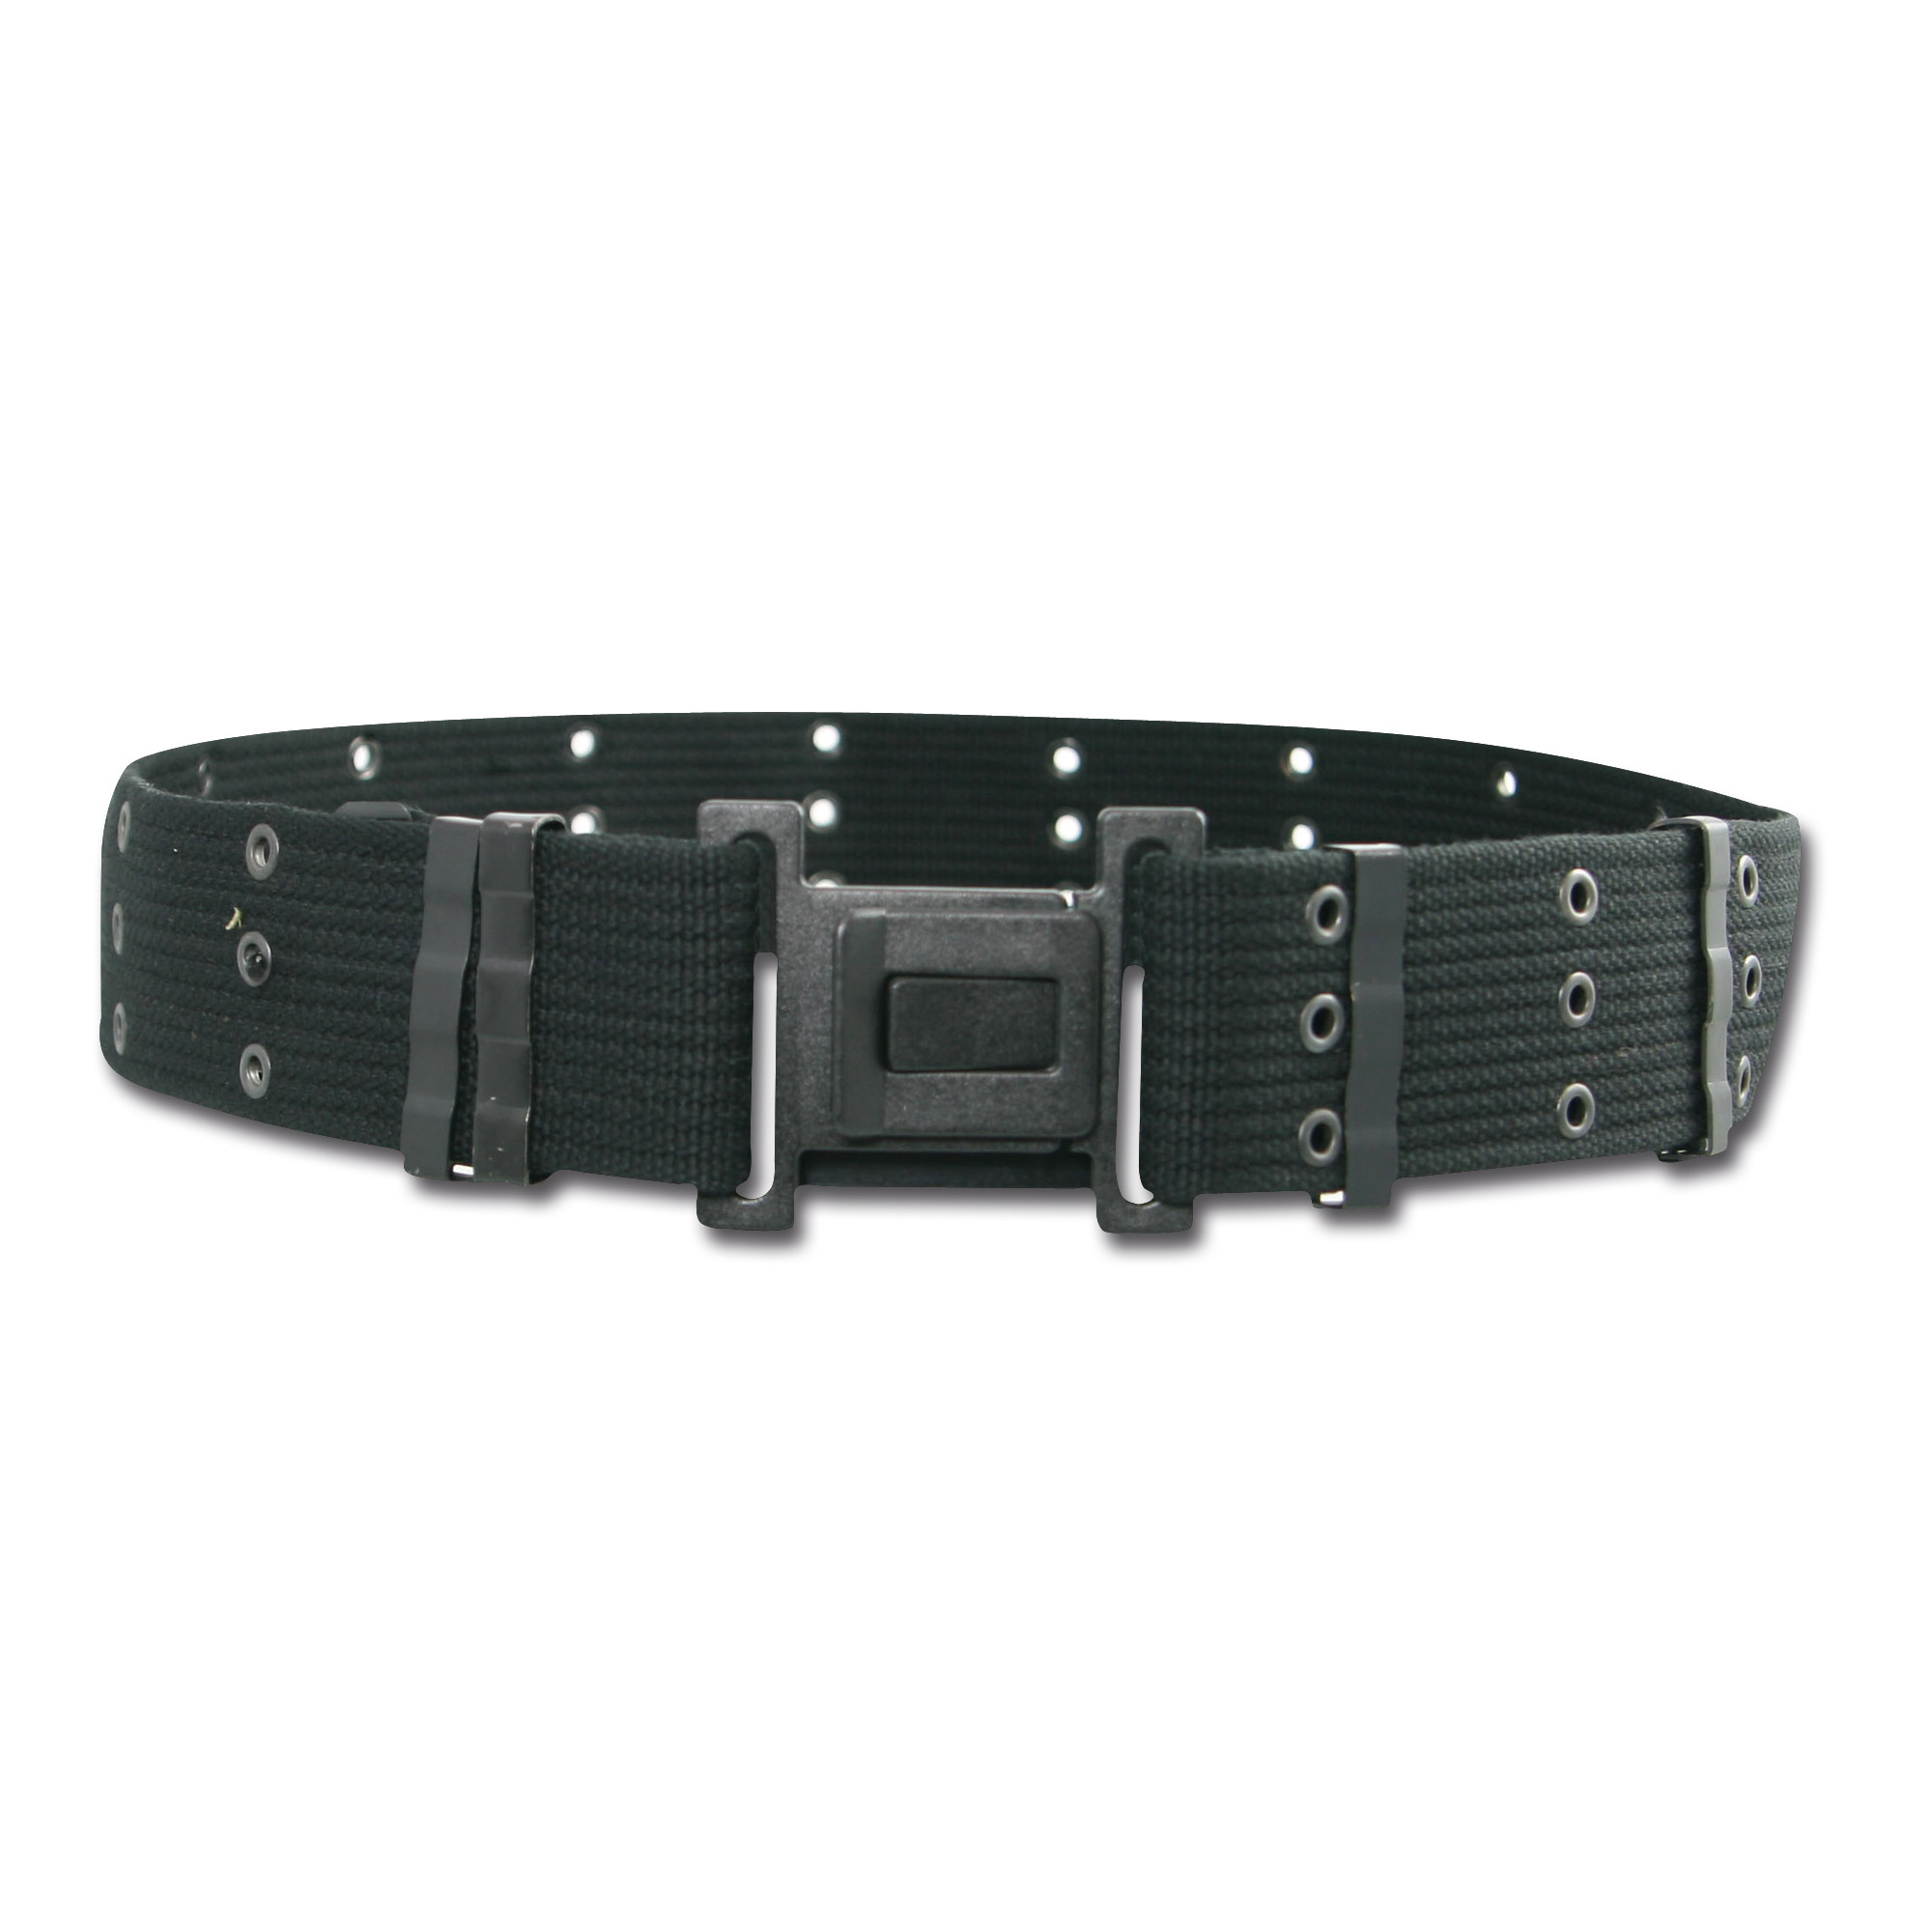 Pistol belt US LC-2 QR style black